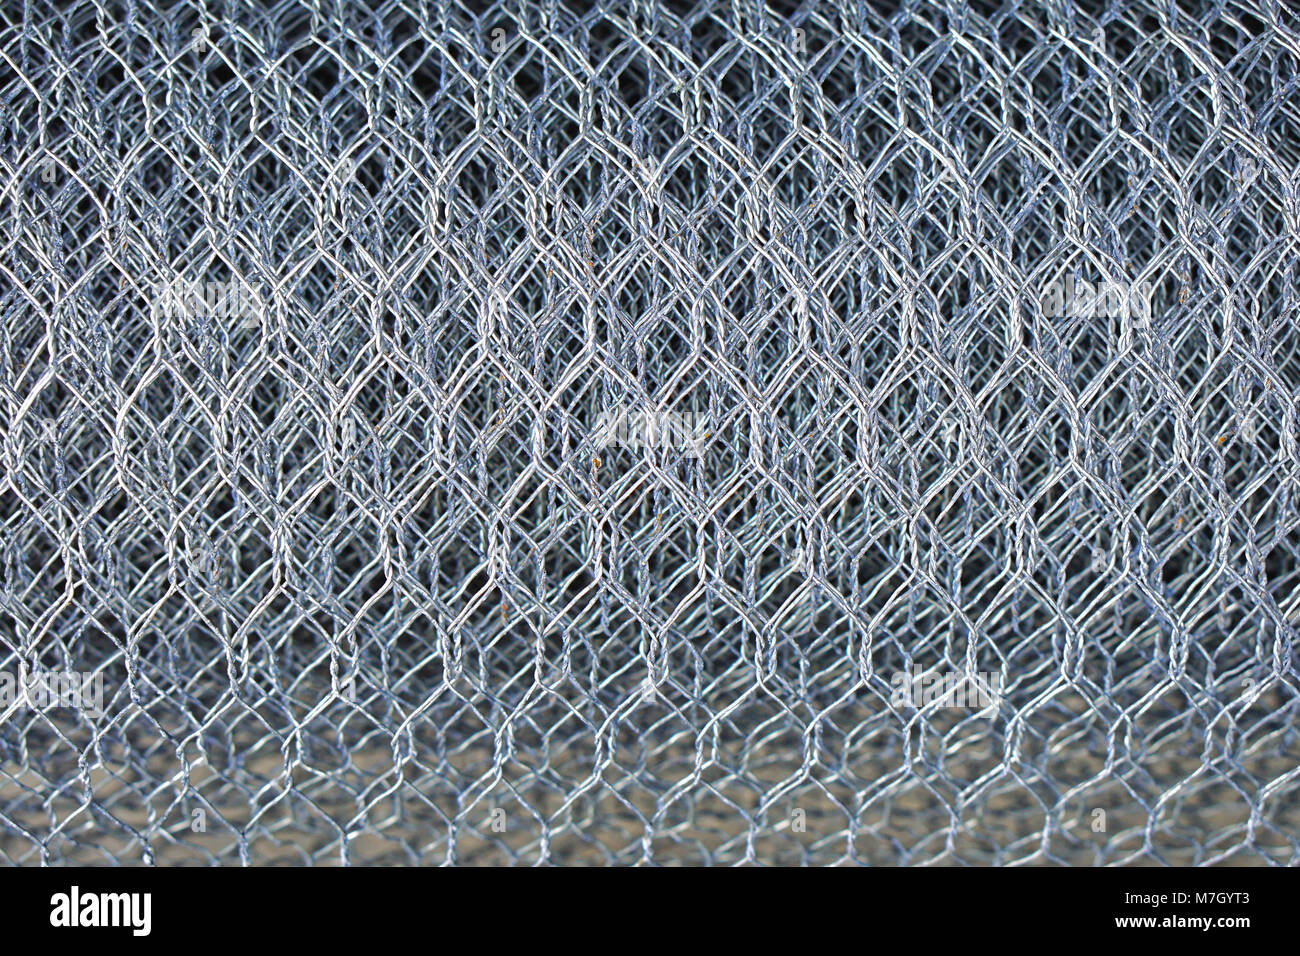 Steel metal mesh chicken wire roll Stock Photo: 176779347 - Alamy